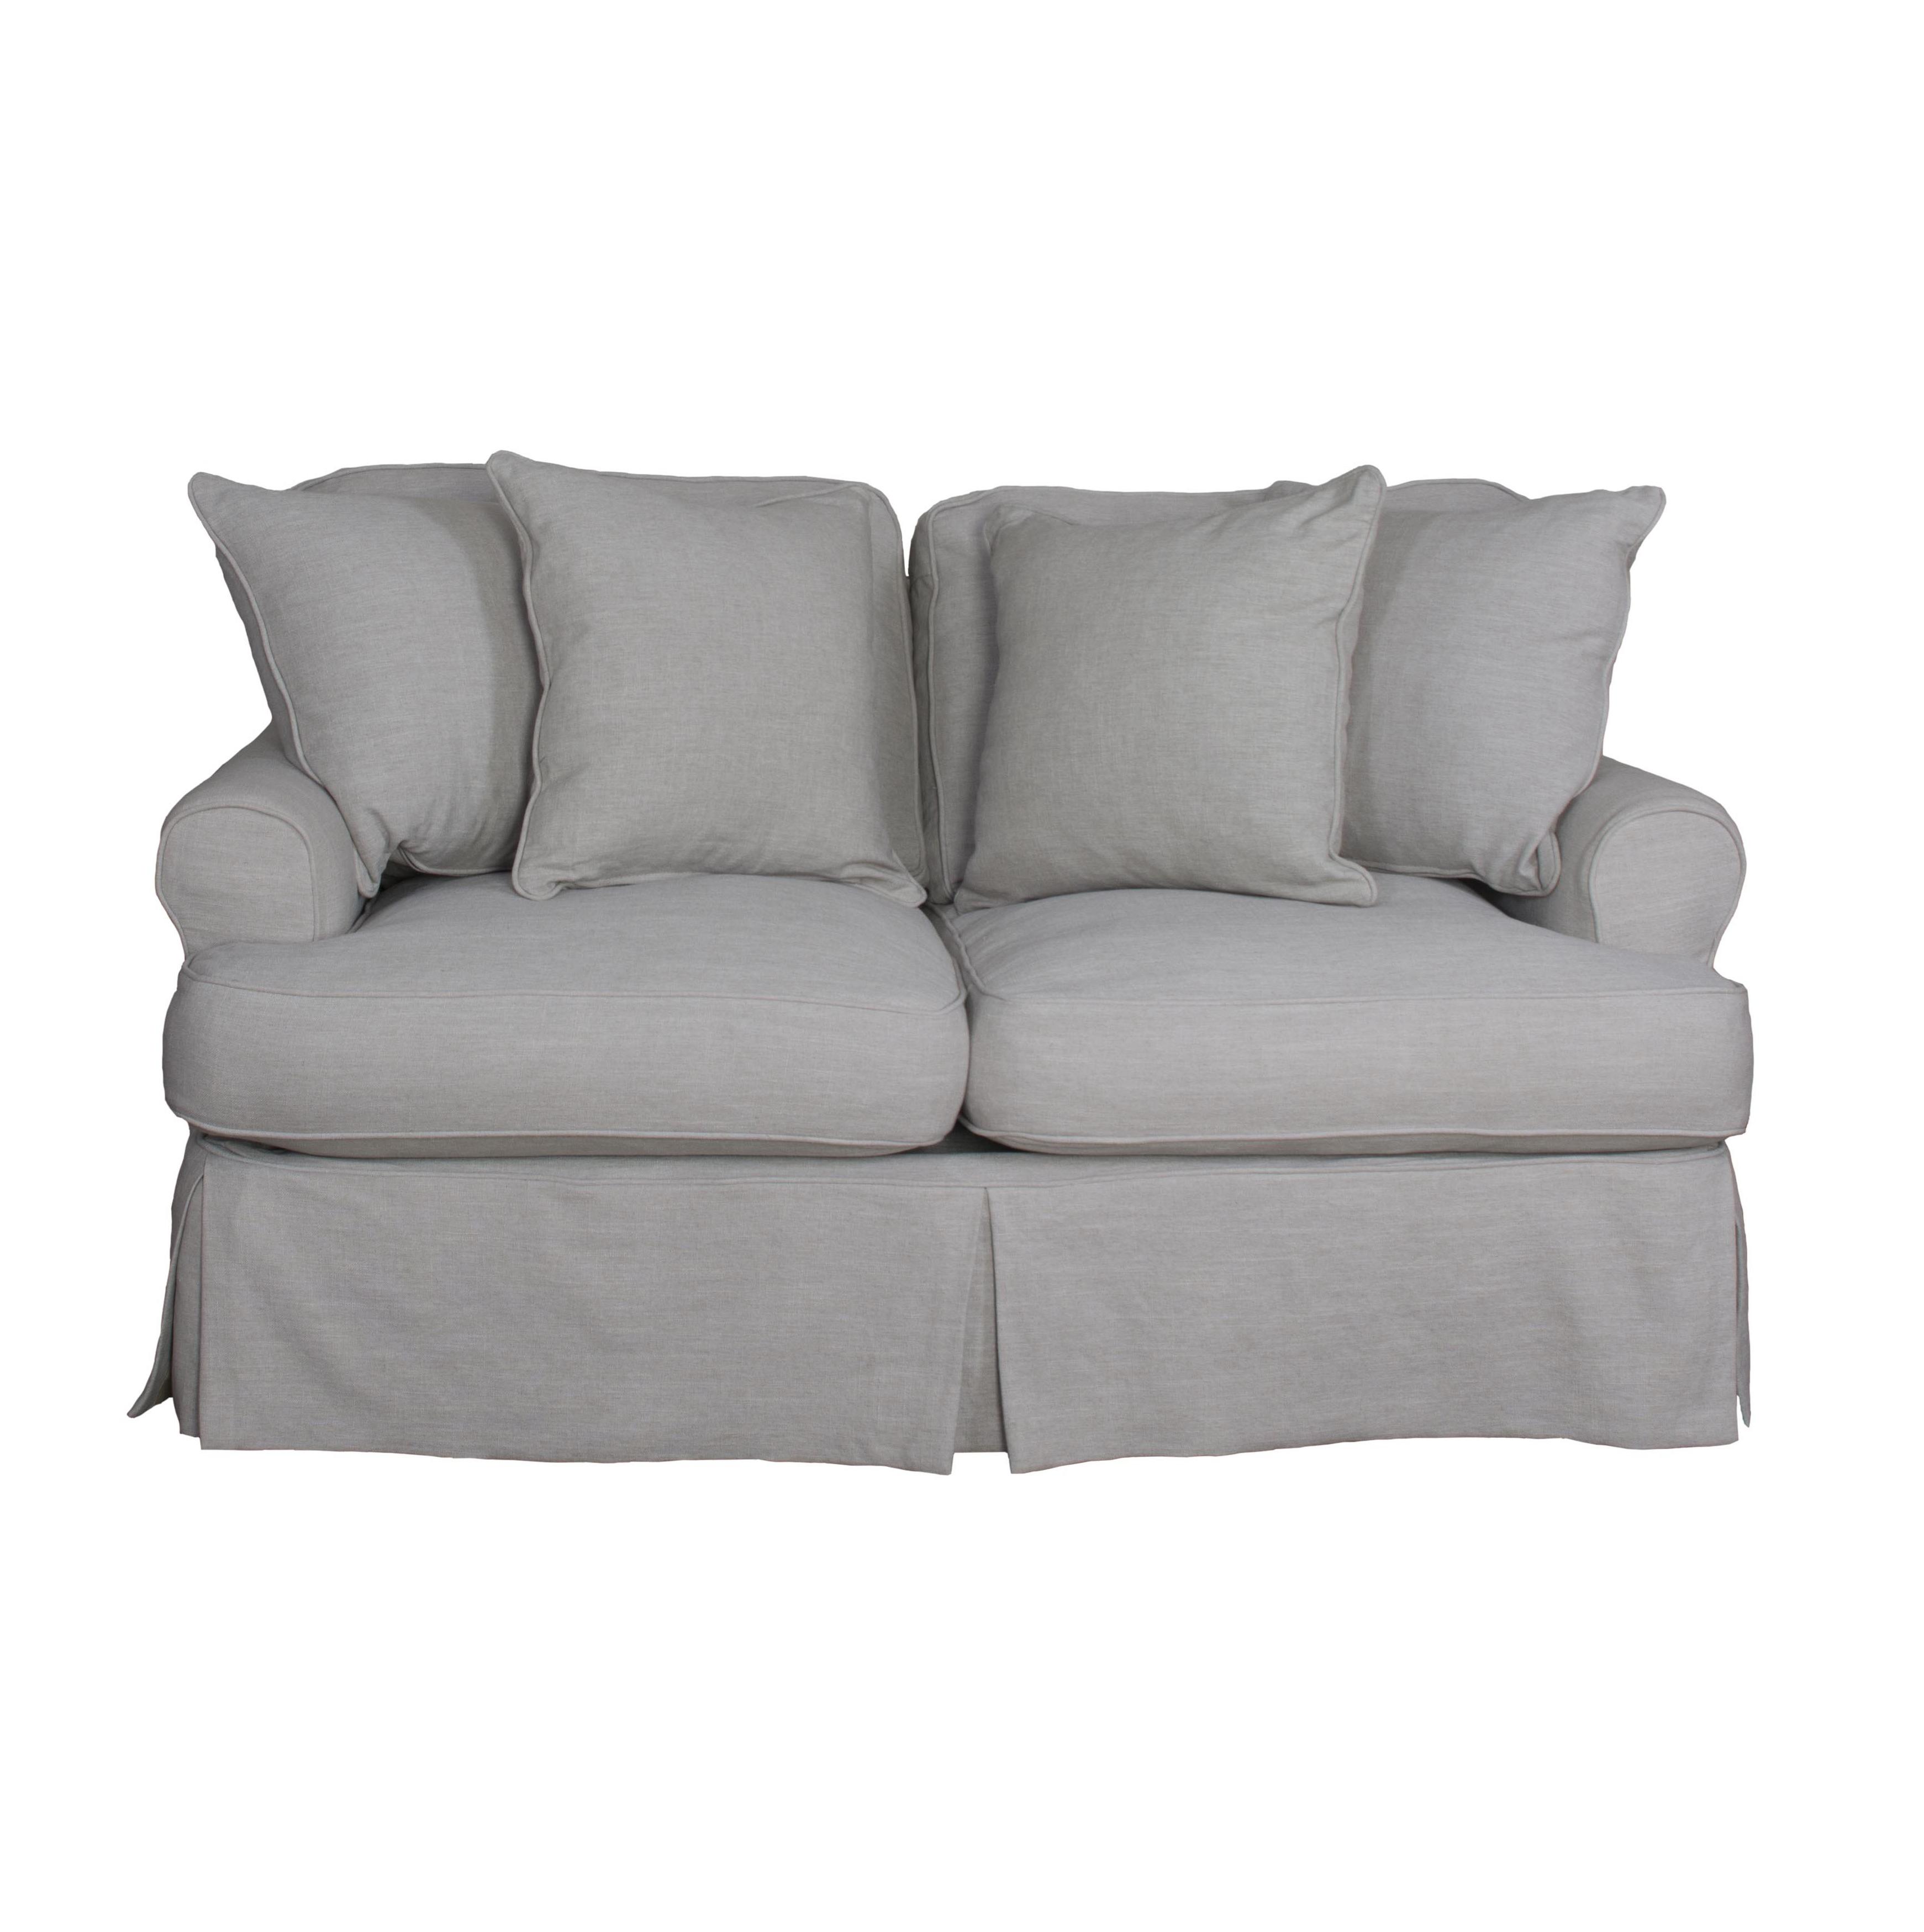 Wayfair Inside 2019 Callie Sofa Chairs (View 9 of 20)